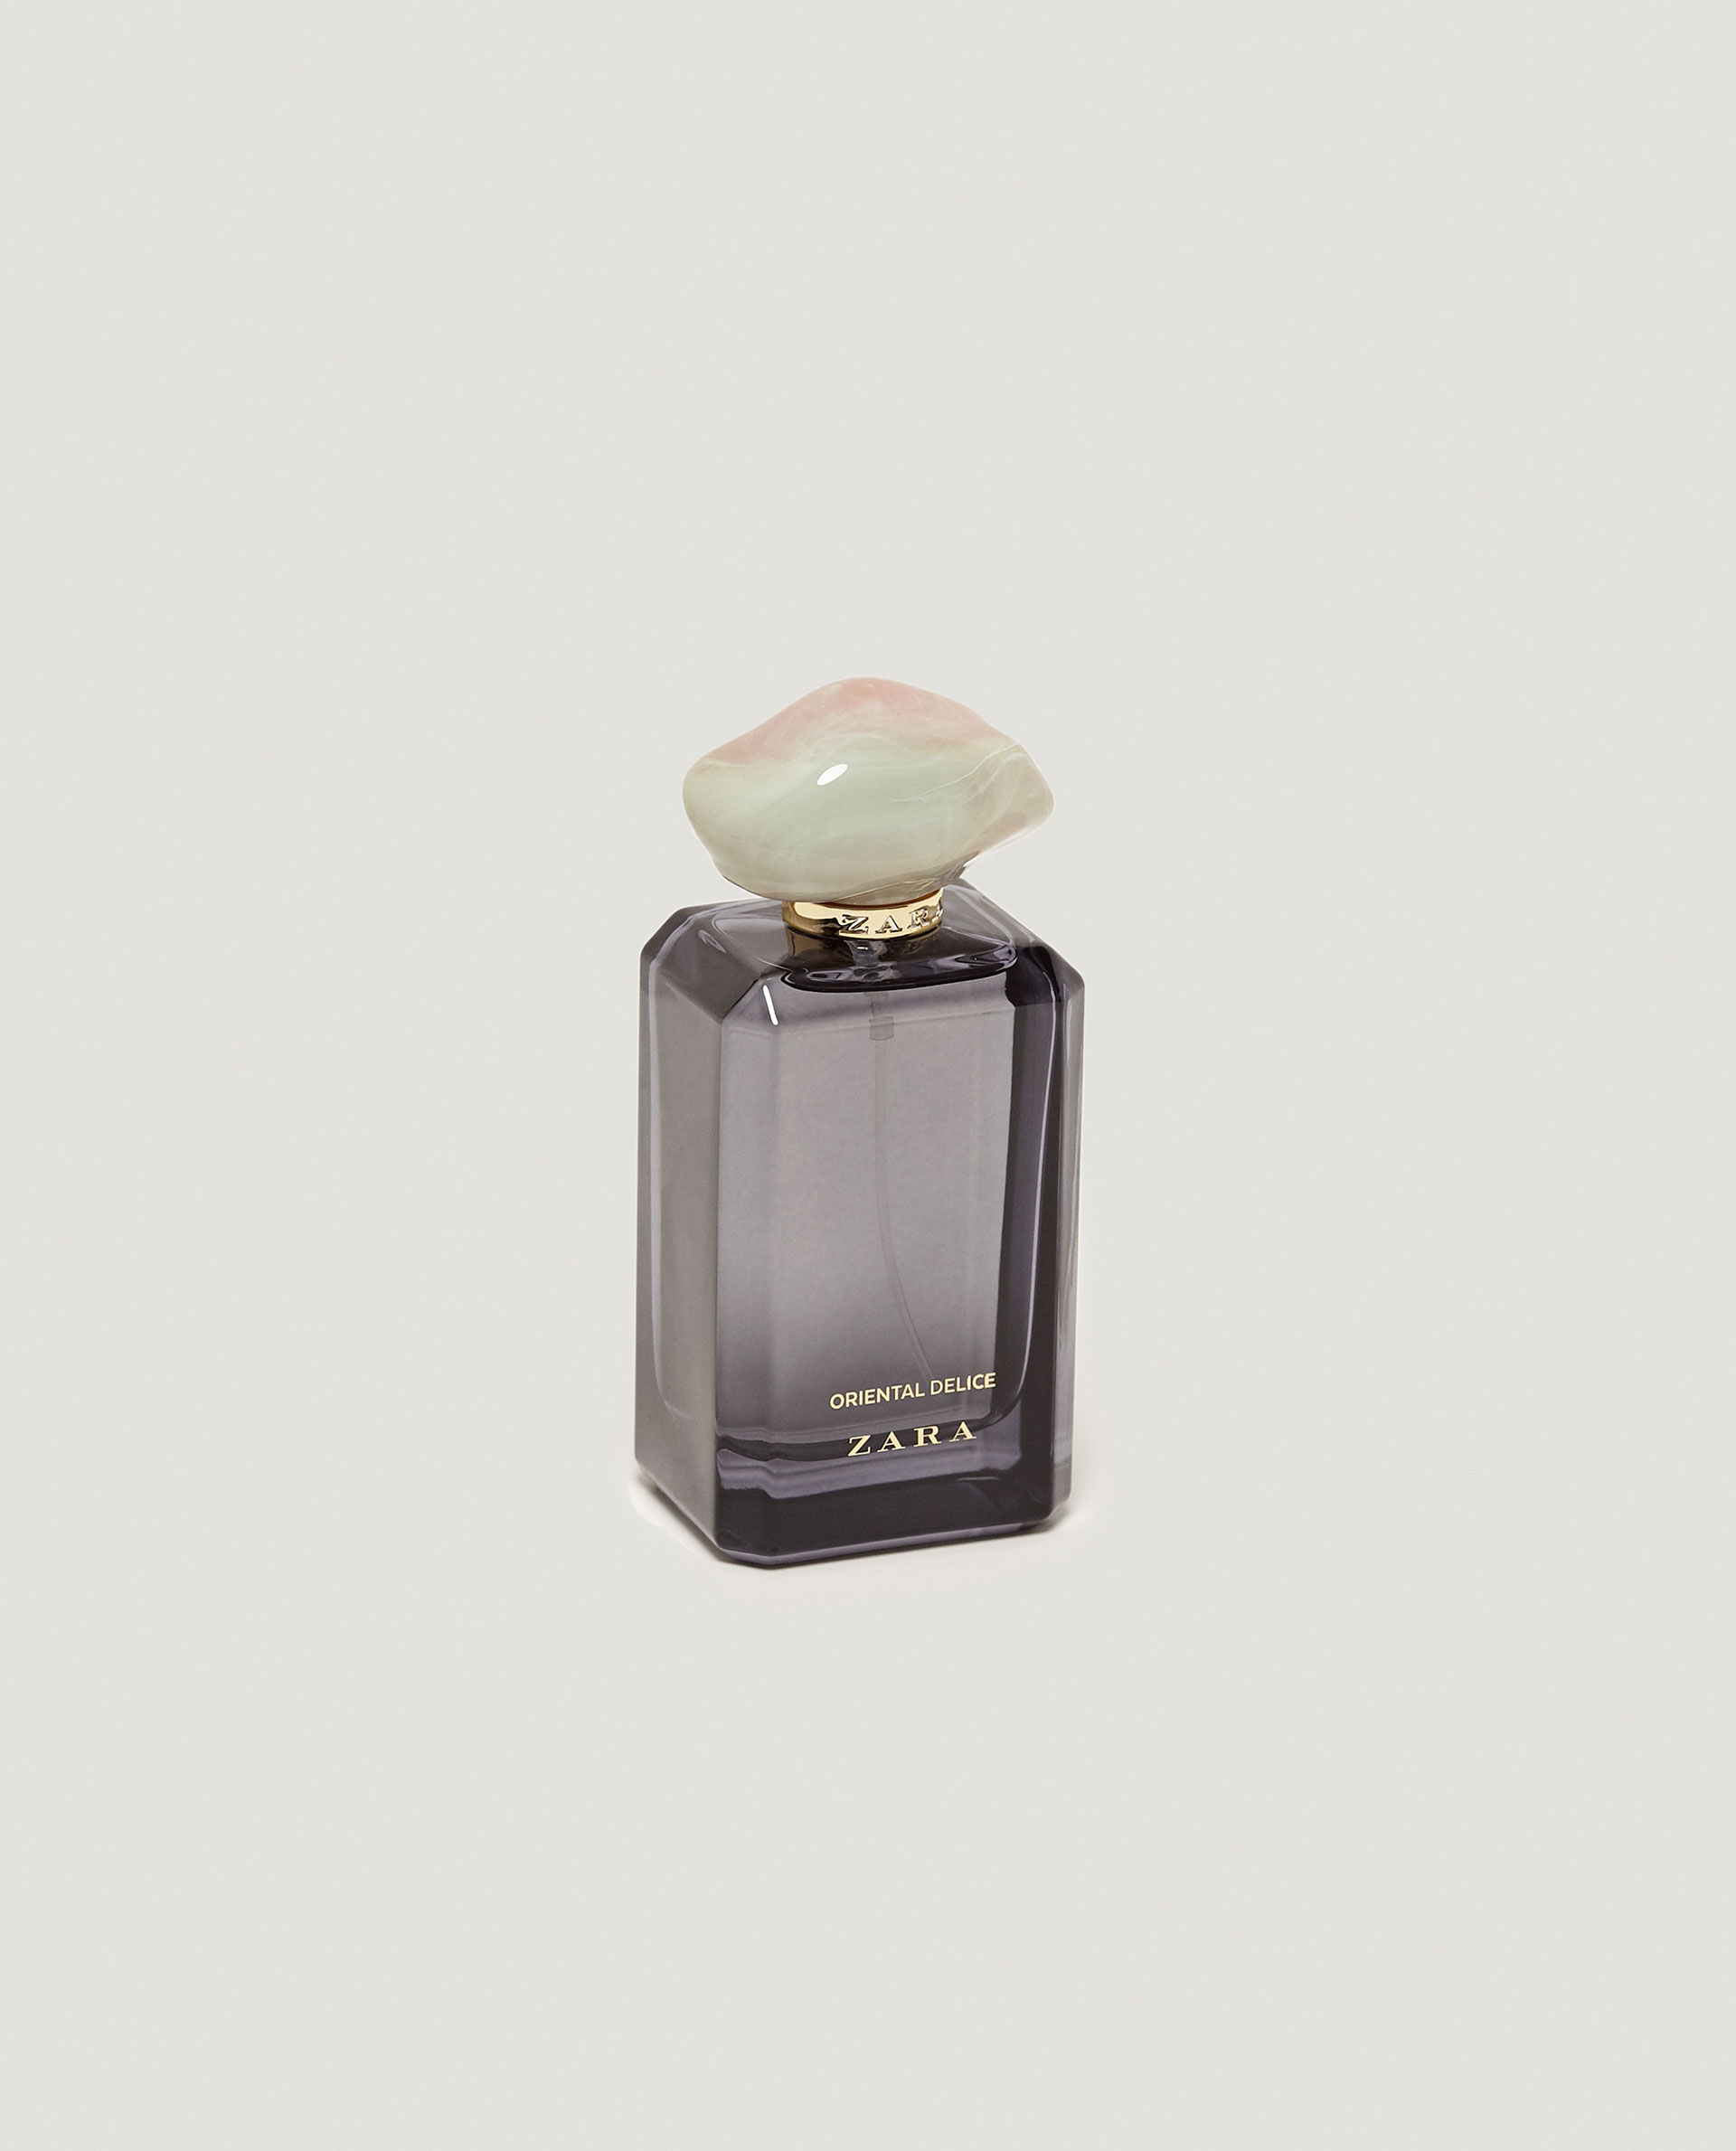 ... Oriental Delice Zara for women Pictures